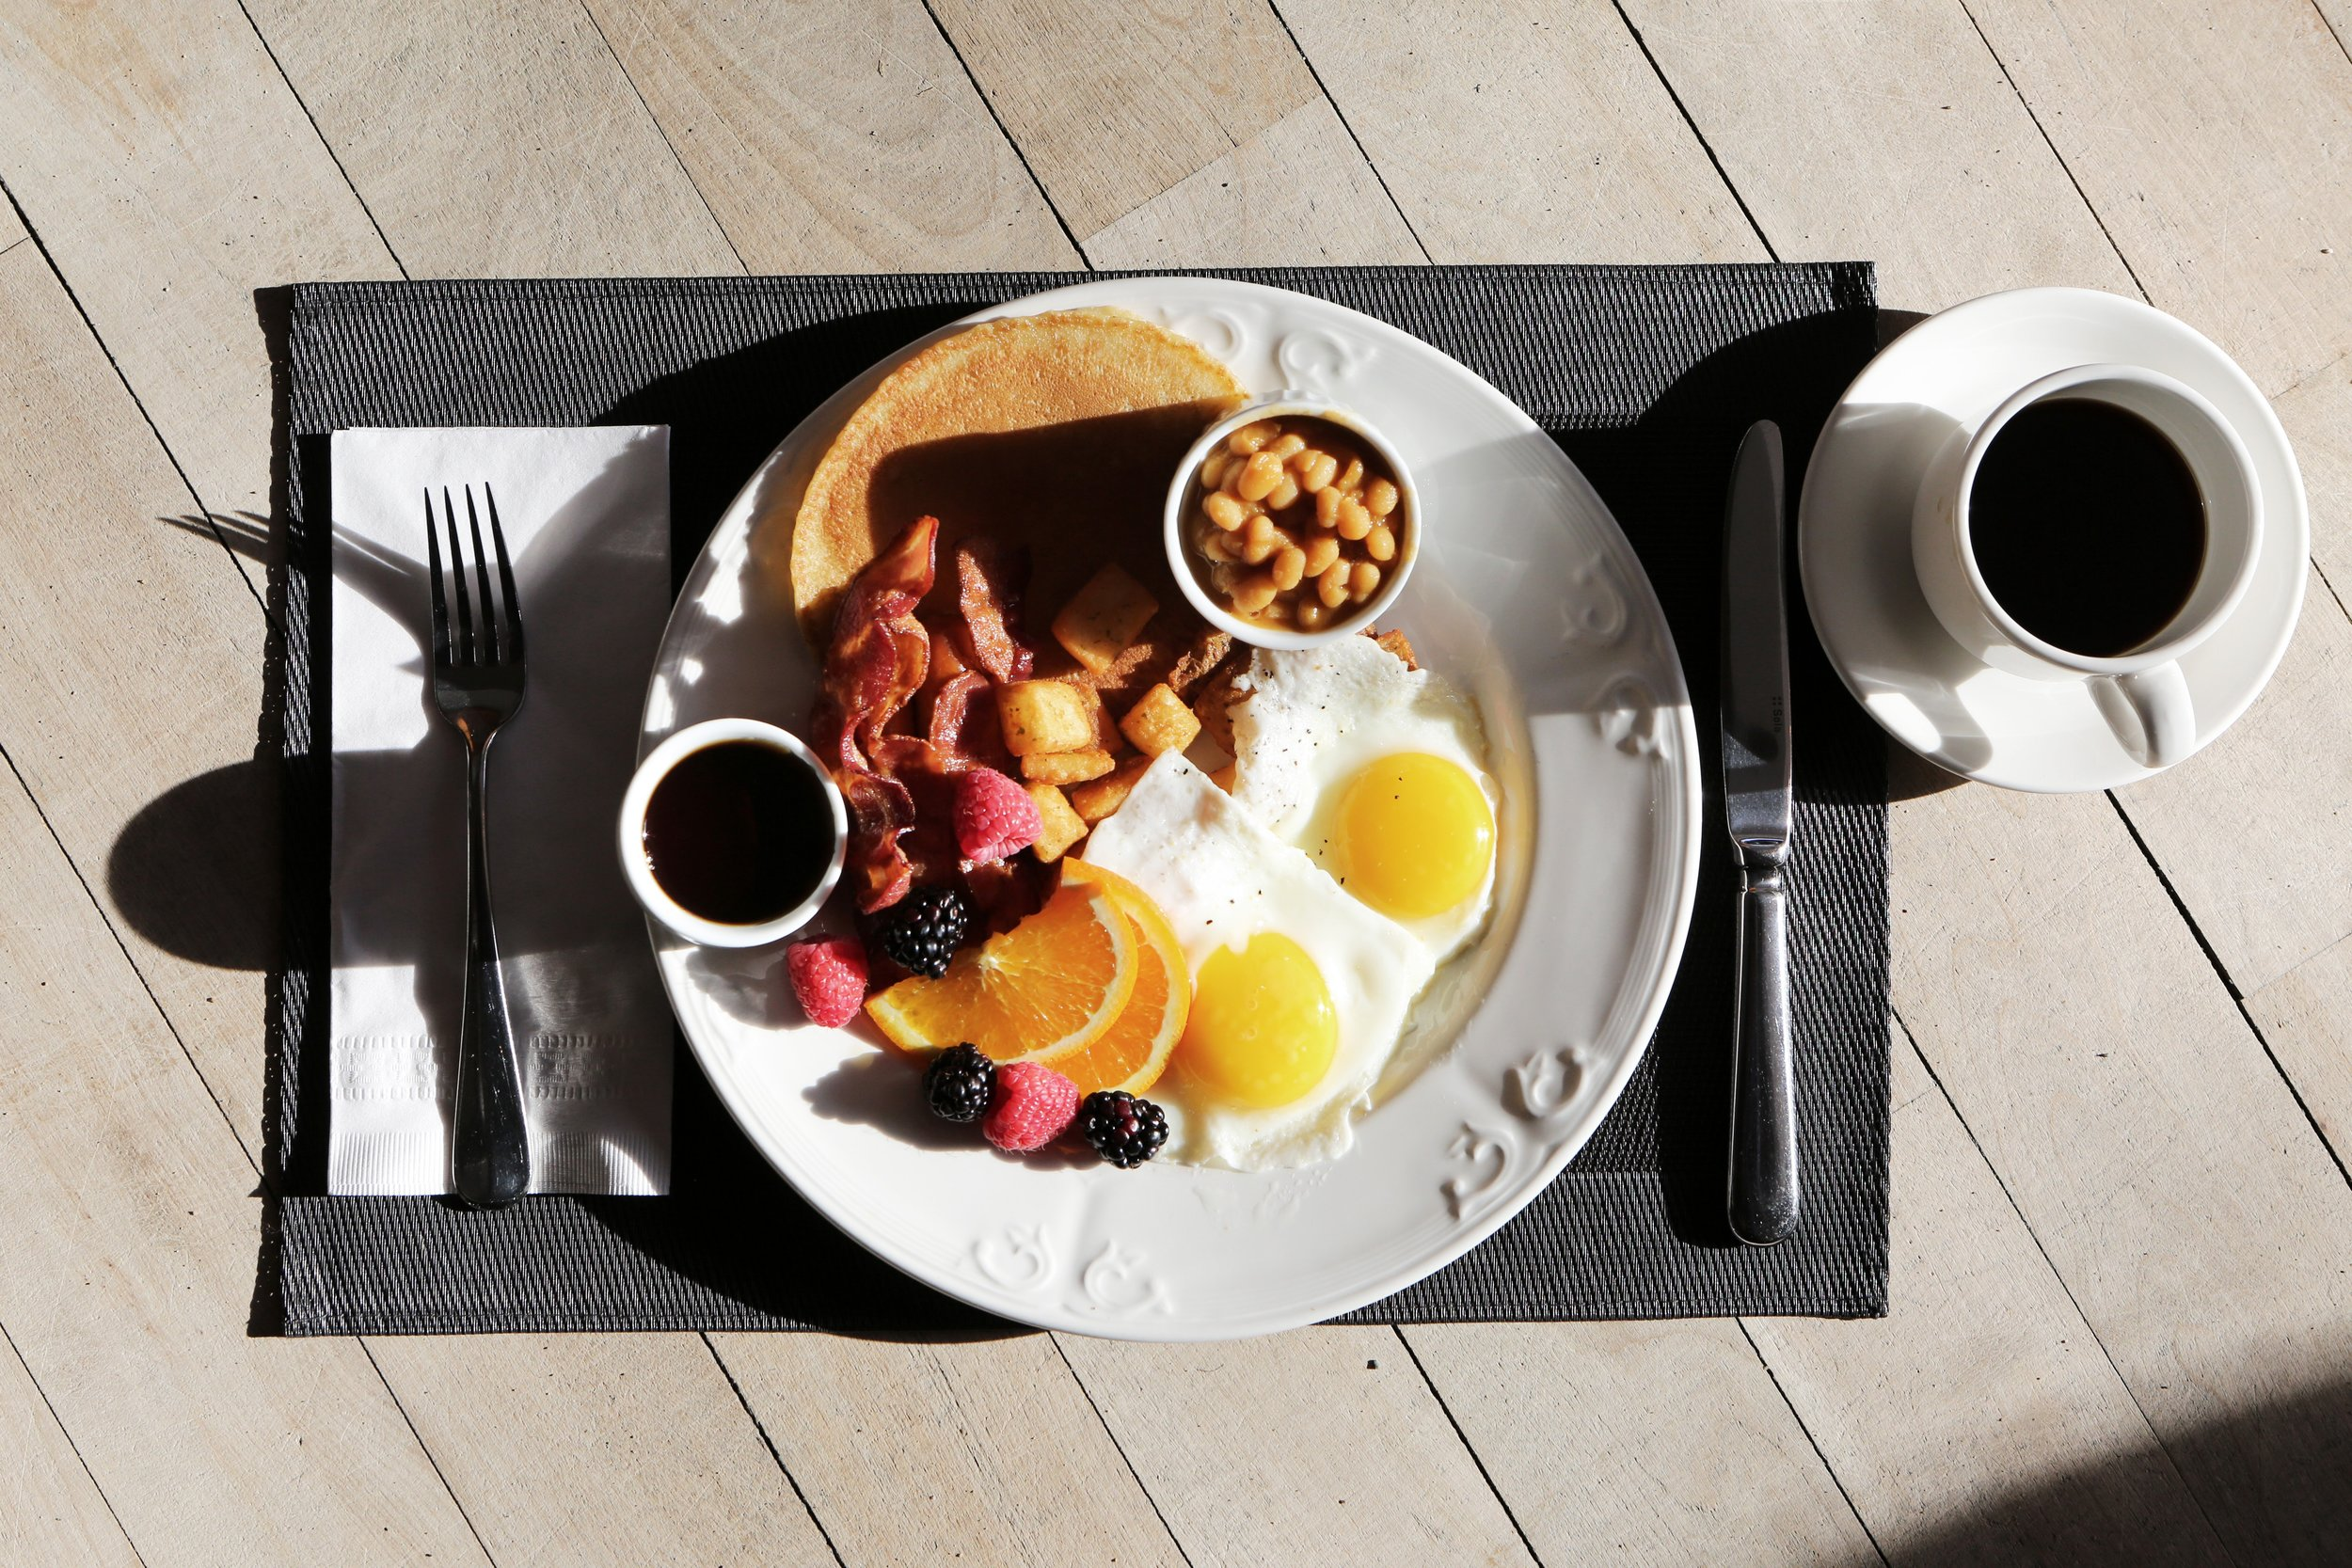 blackberries-breakfast-caffeine-101533.jpg